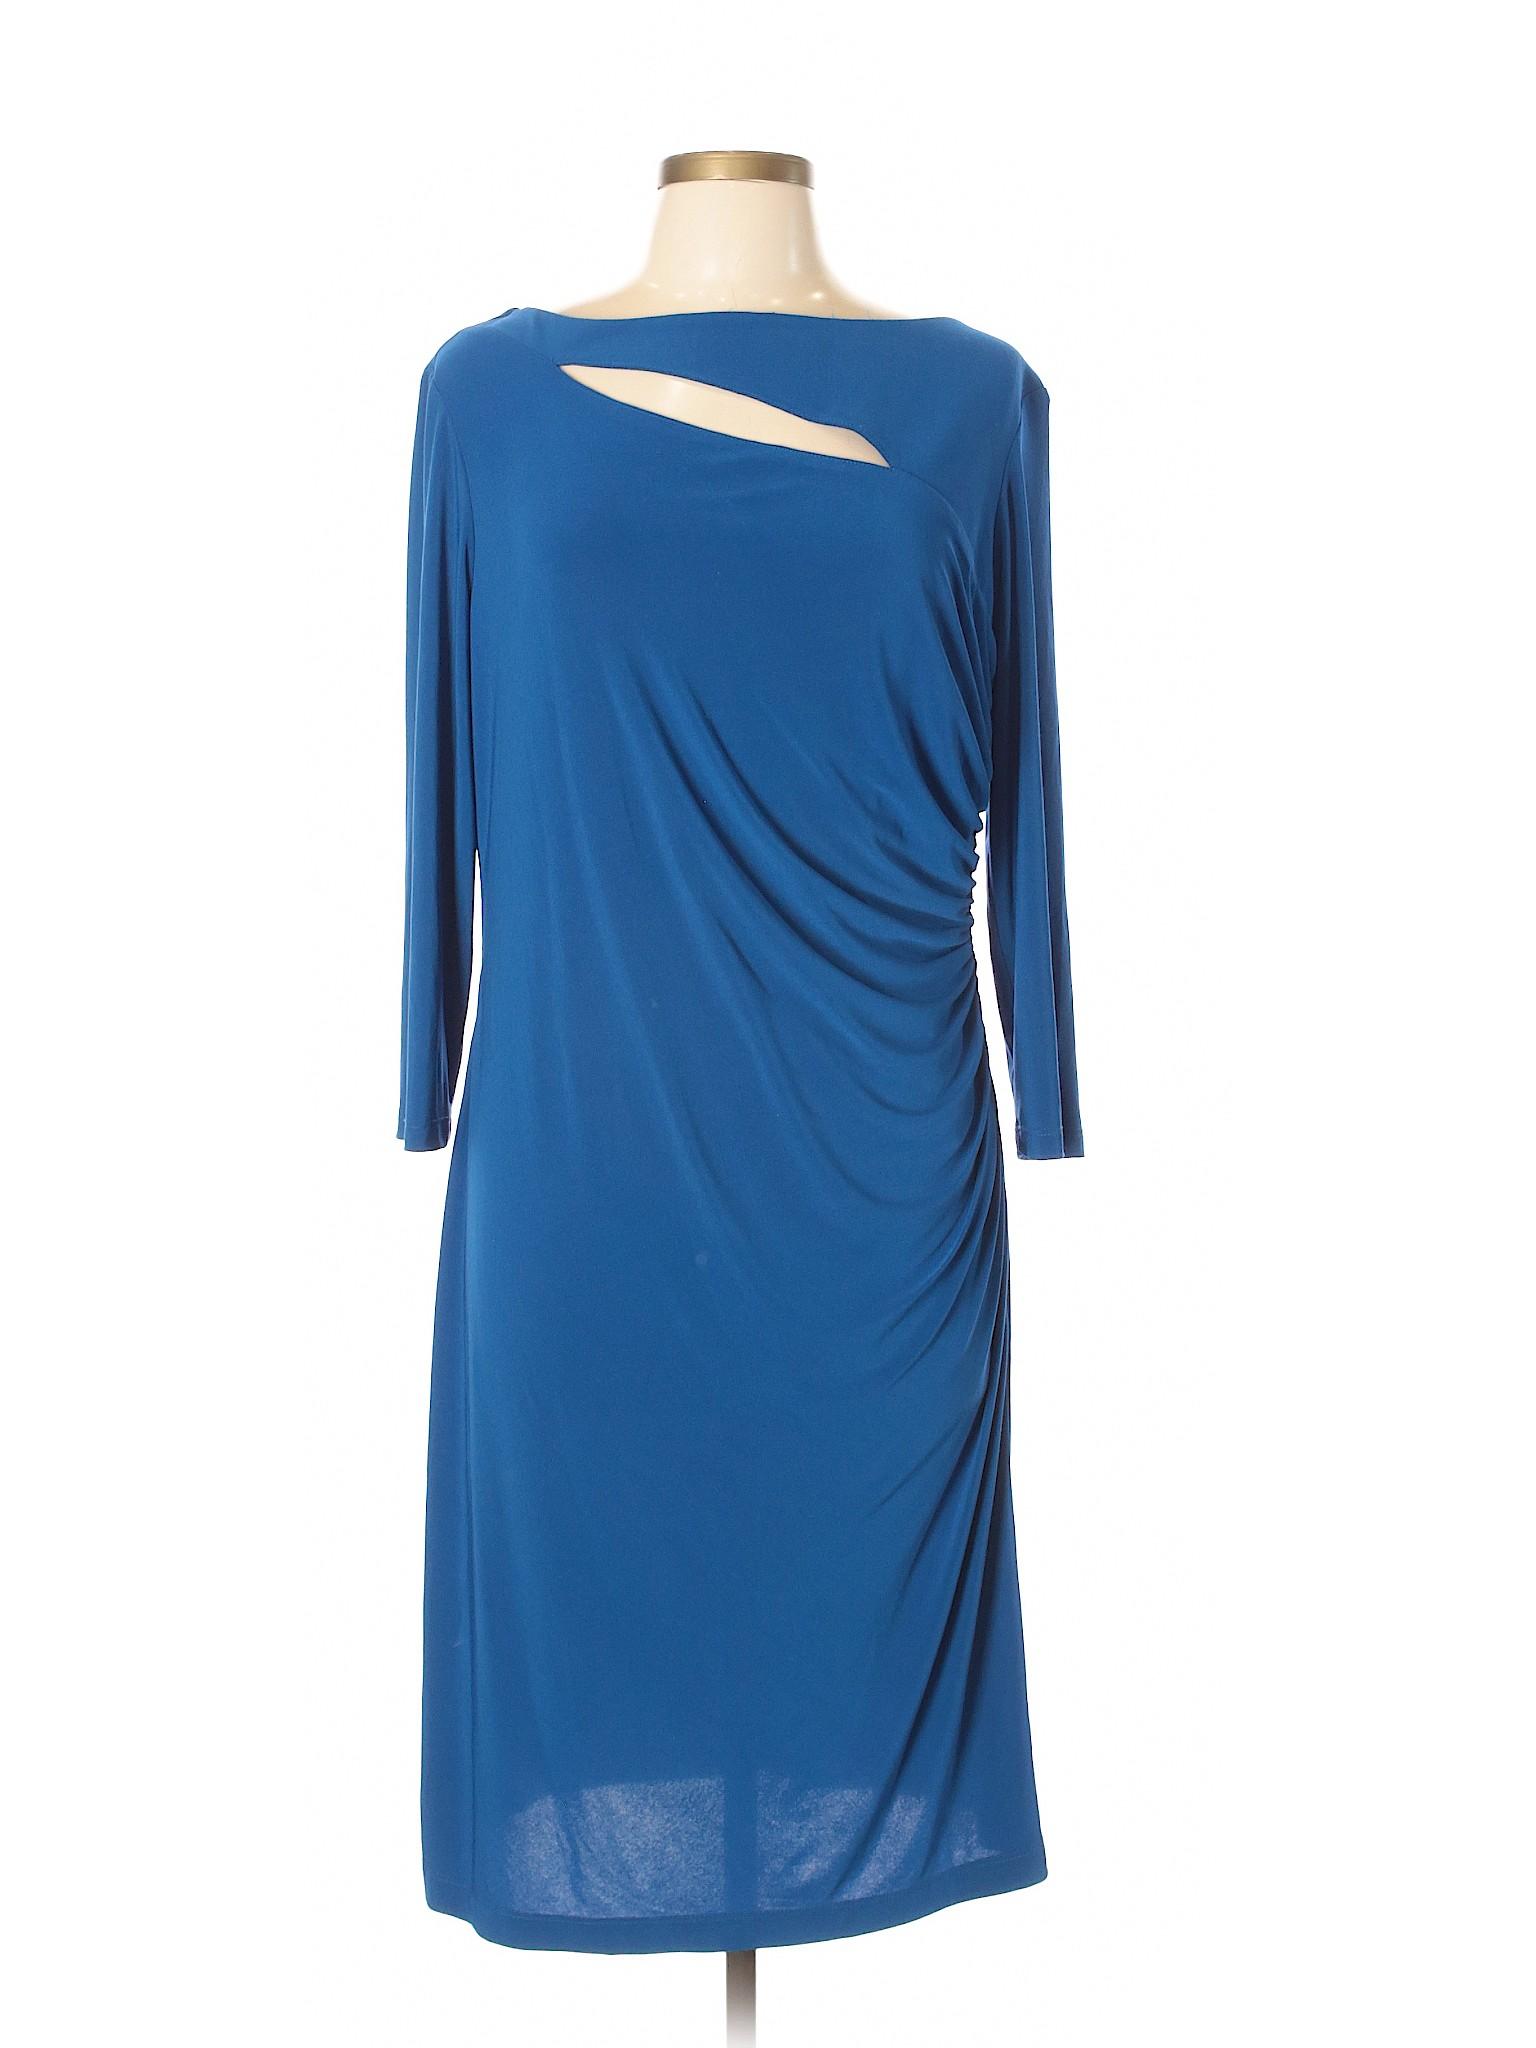 Boutique Cocktail B Dress Tiana winter 7w8qXU